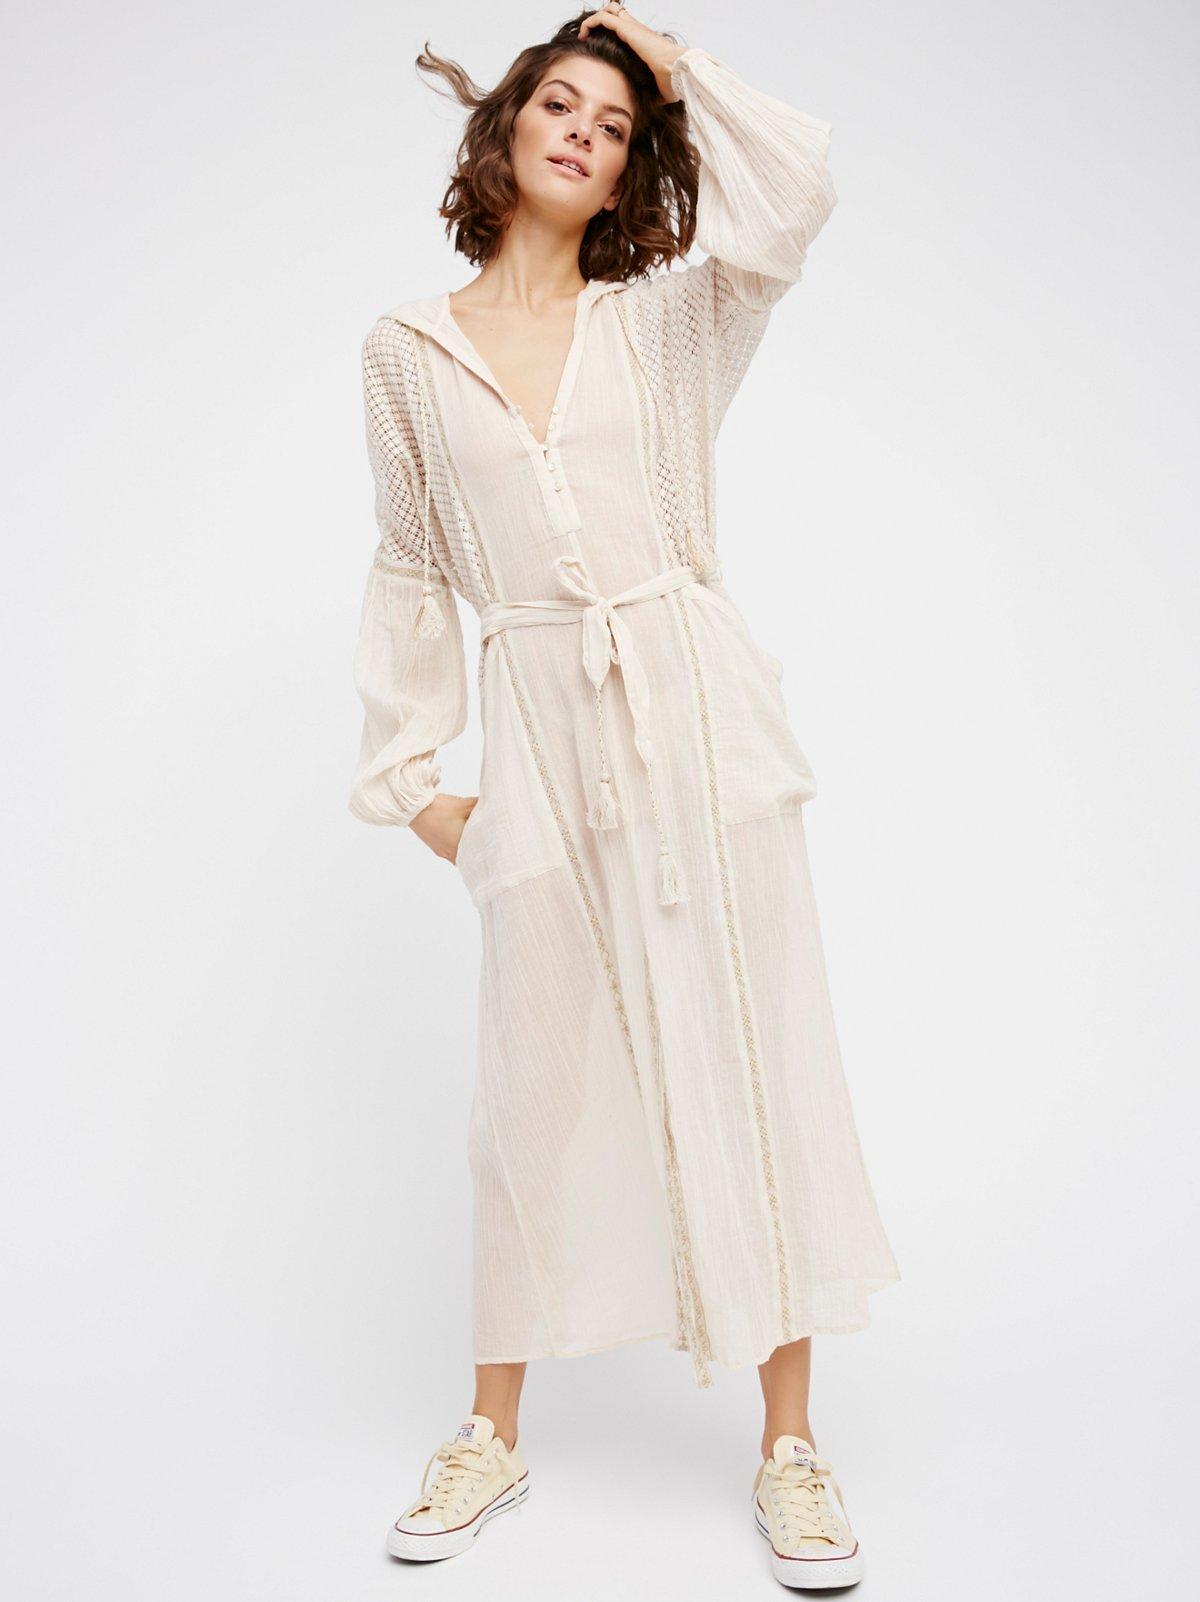 Most Loveliest Hoodie Dress